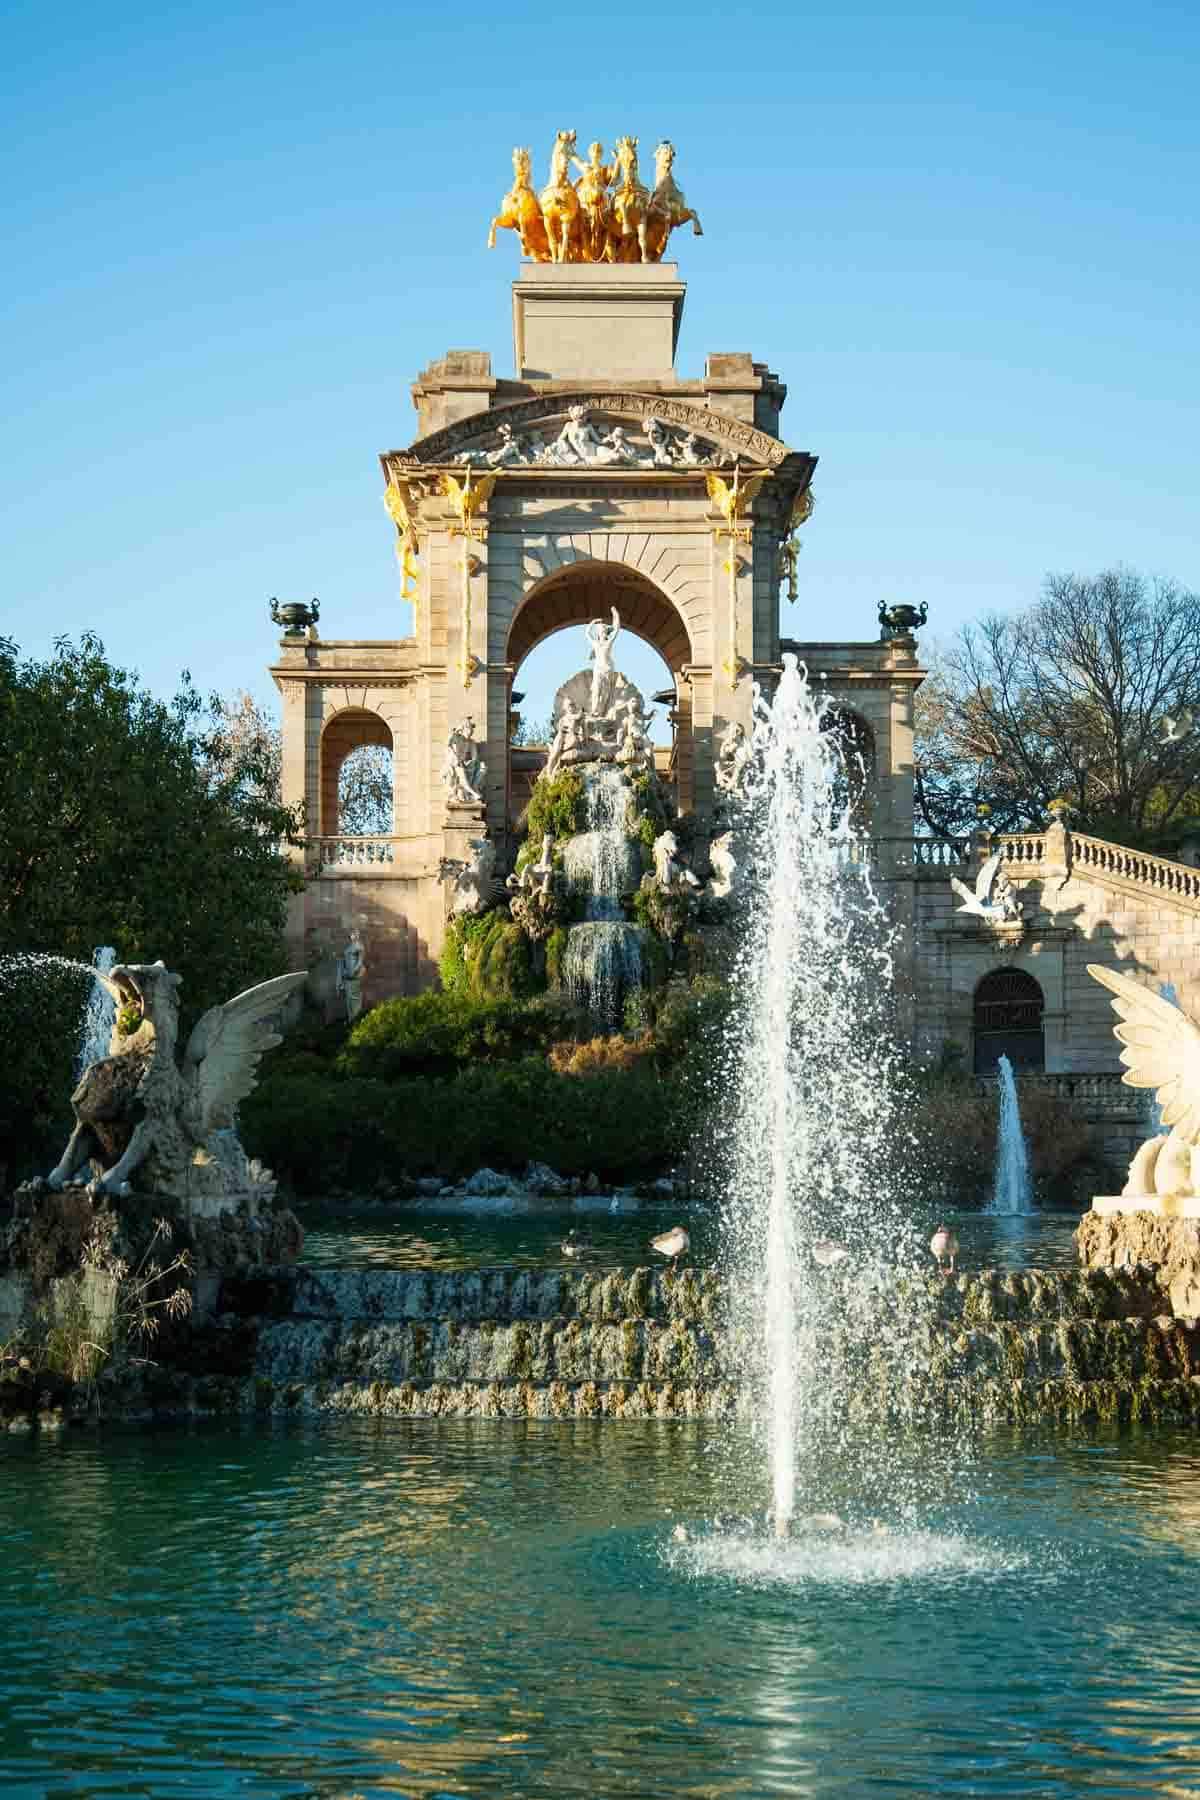 famous buildings in barcelona gaudi buildings and architecture cascada fountain park de la ciutadella